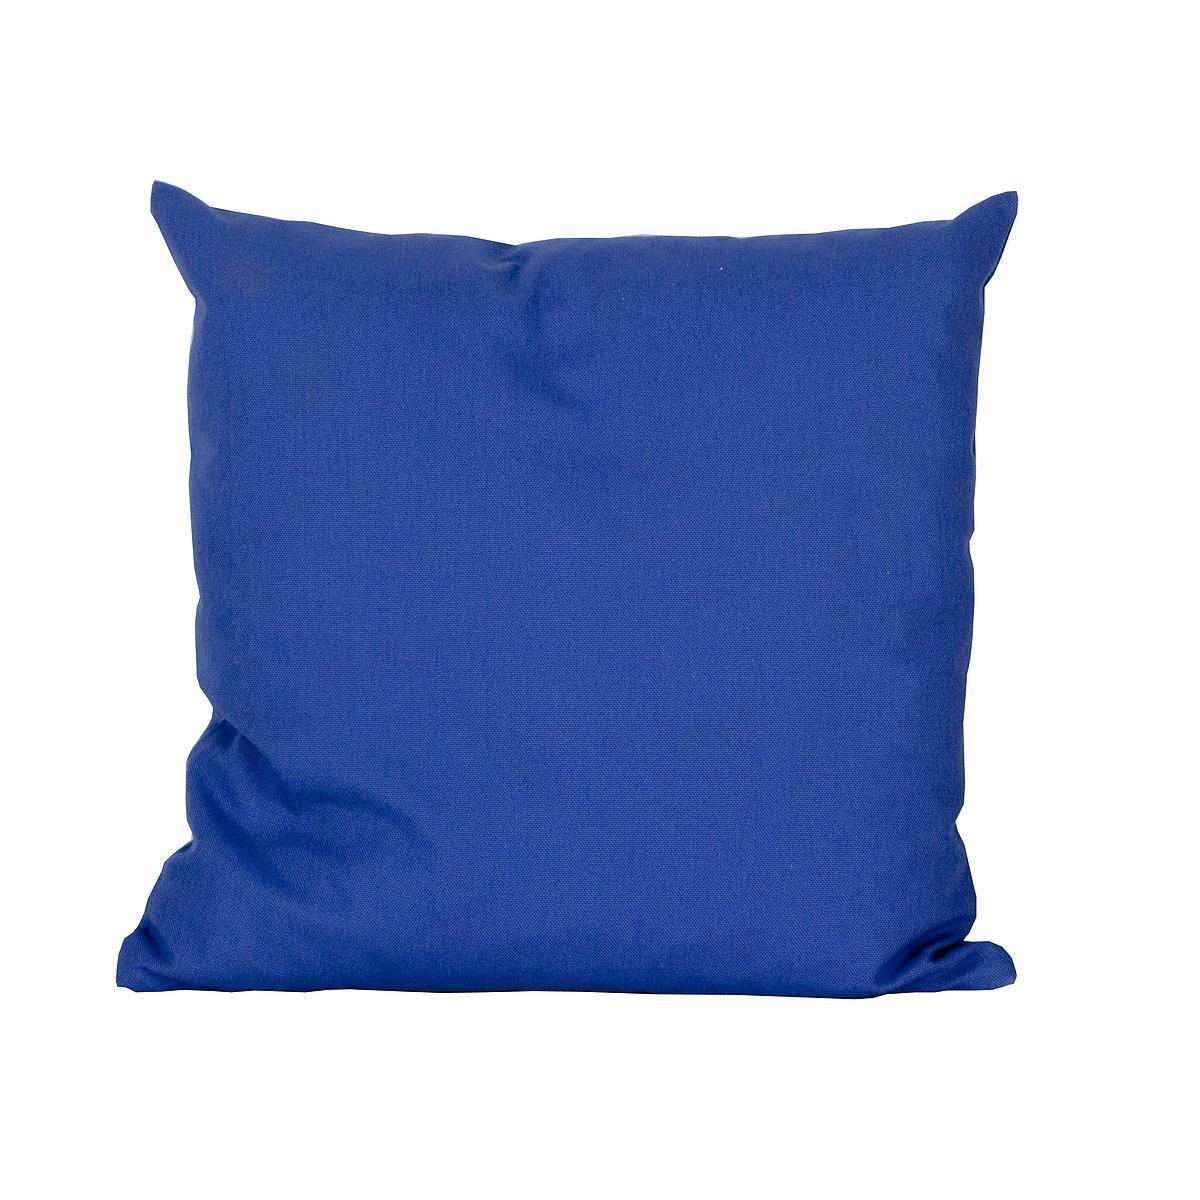 Kissen klein 40x40 DELUXE de Breuyn in dunkelblau